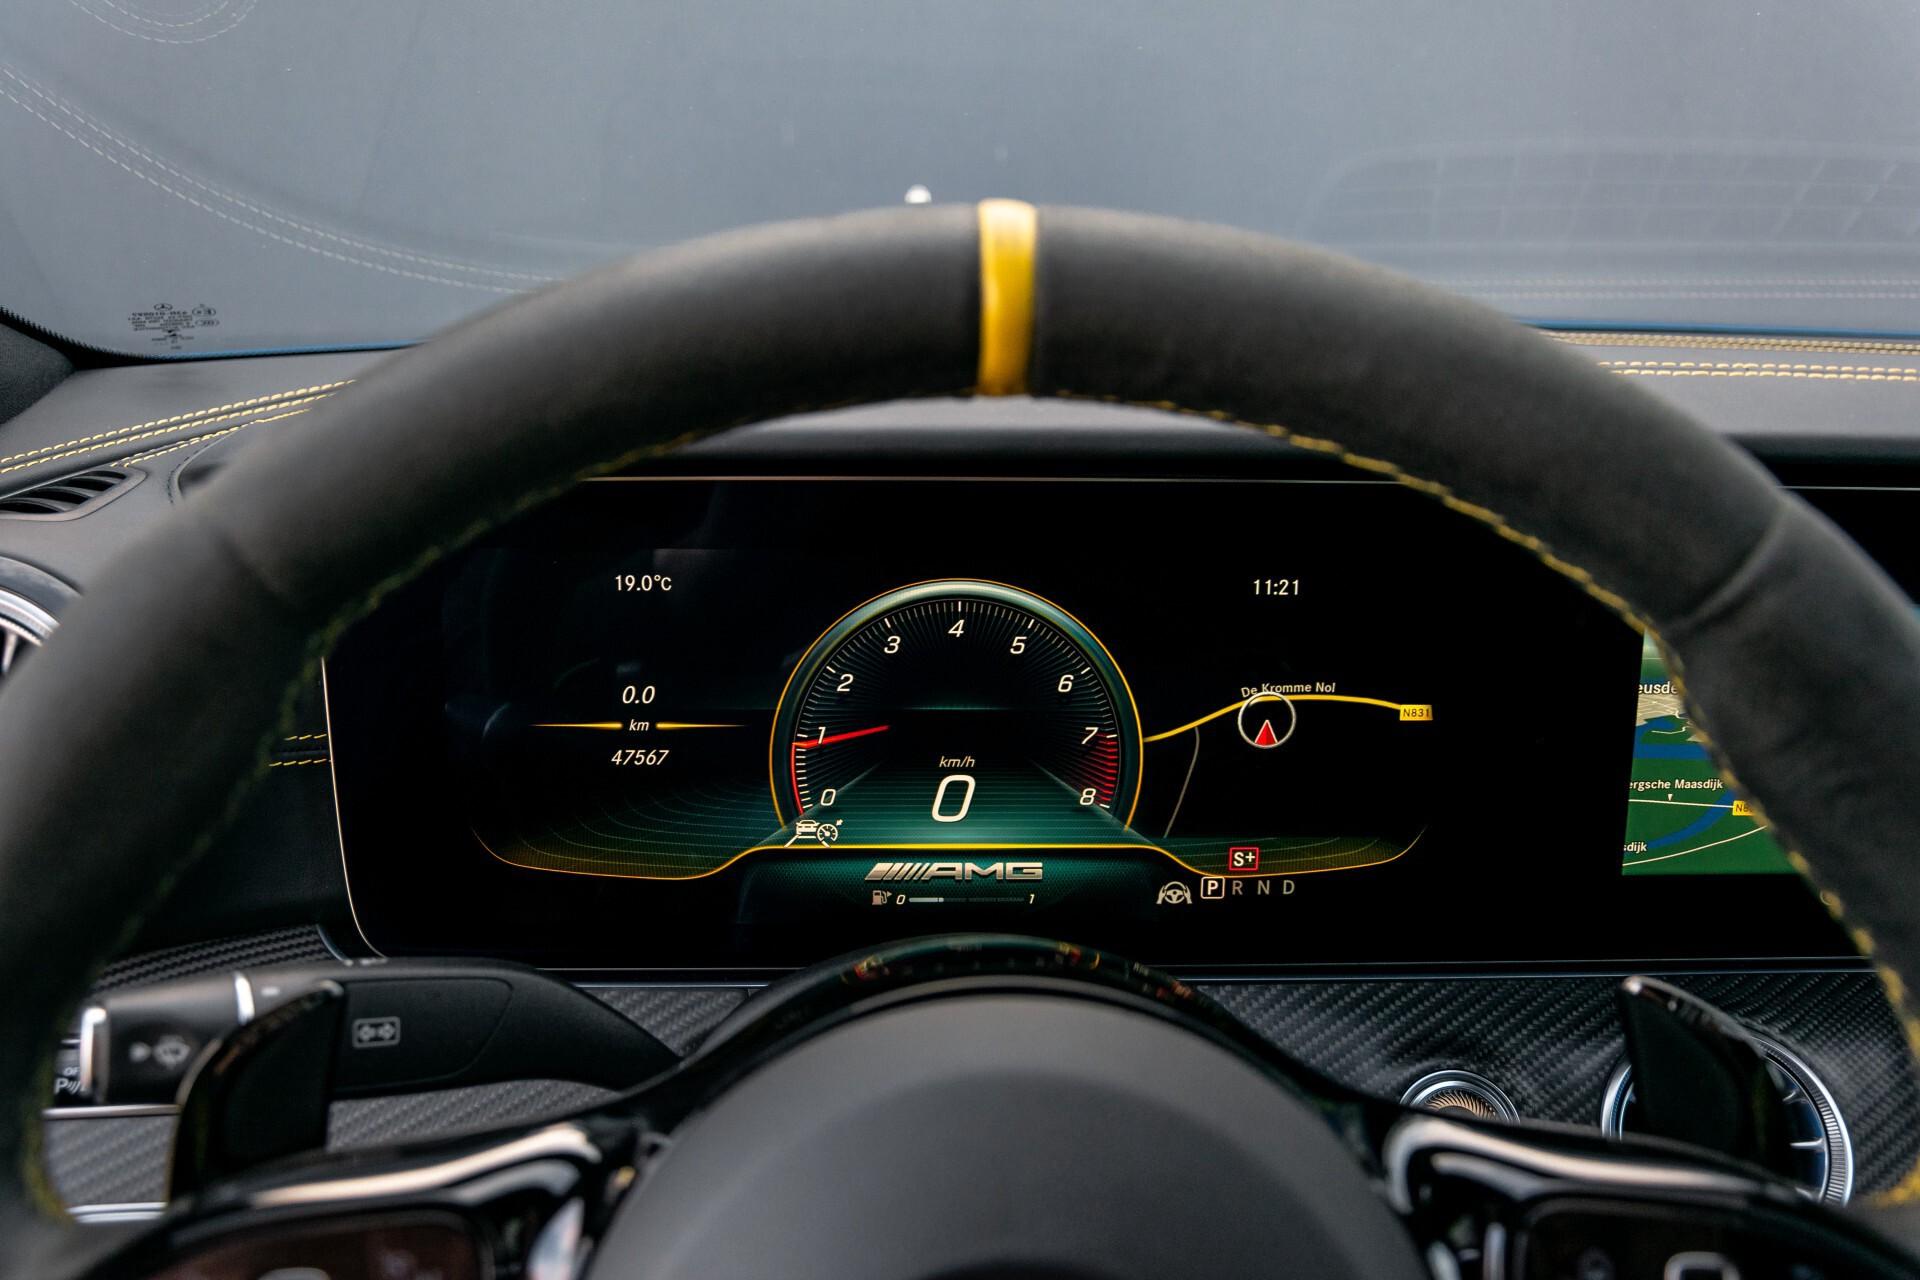 Mercedes-Benz AMG GT 4-Door Coupe 63 S 4MATIC+ Edition 1 Keramisch/Carbon/First Class/Dynamic Plus/Burmester High End 3D Aut9 Foto 14